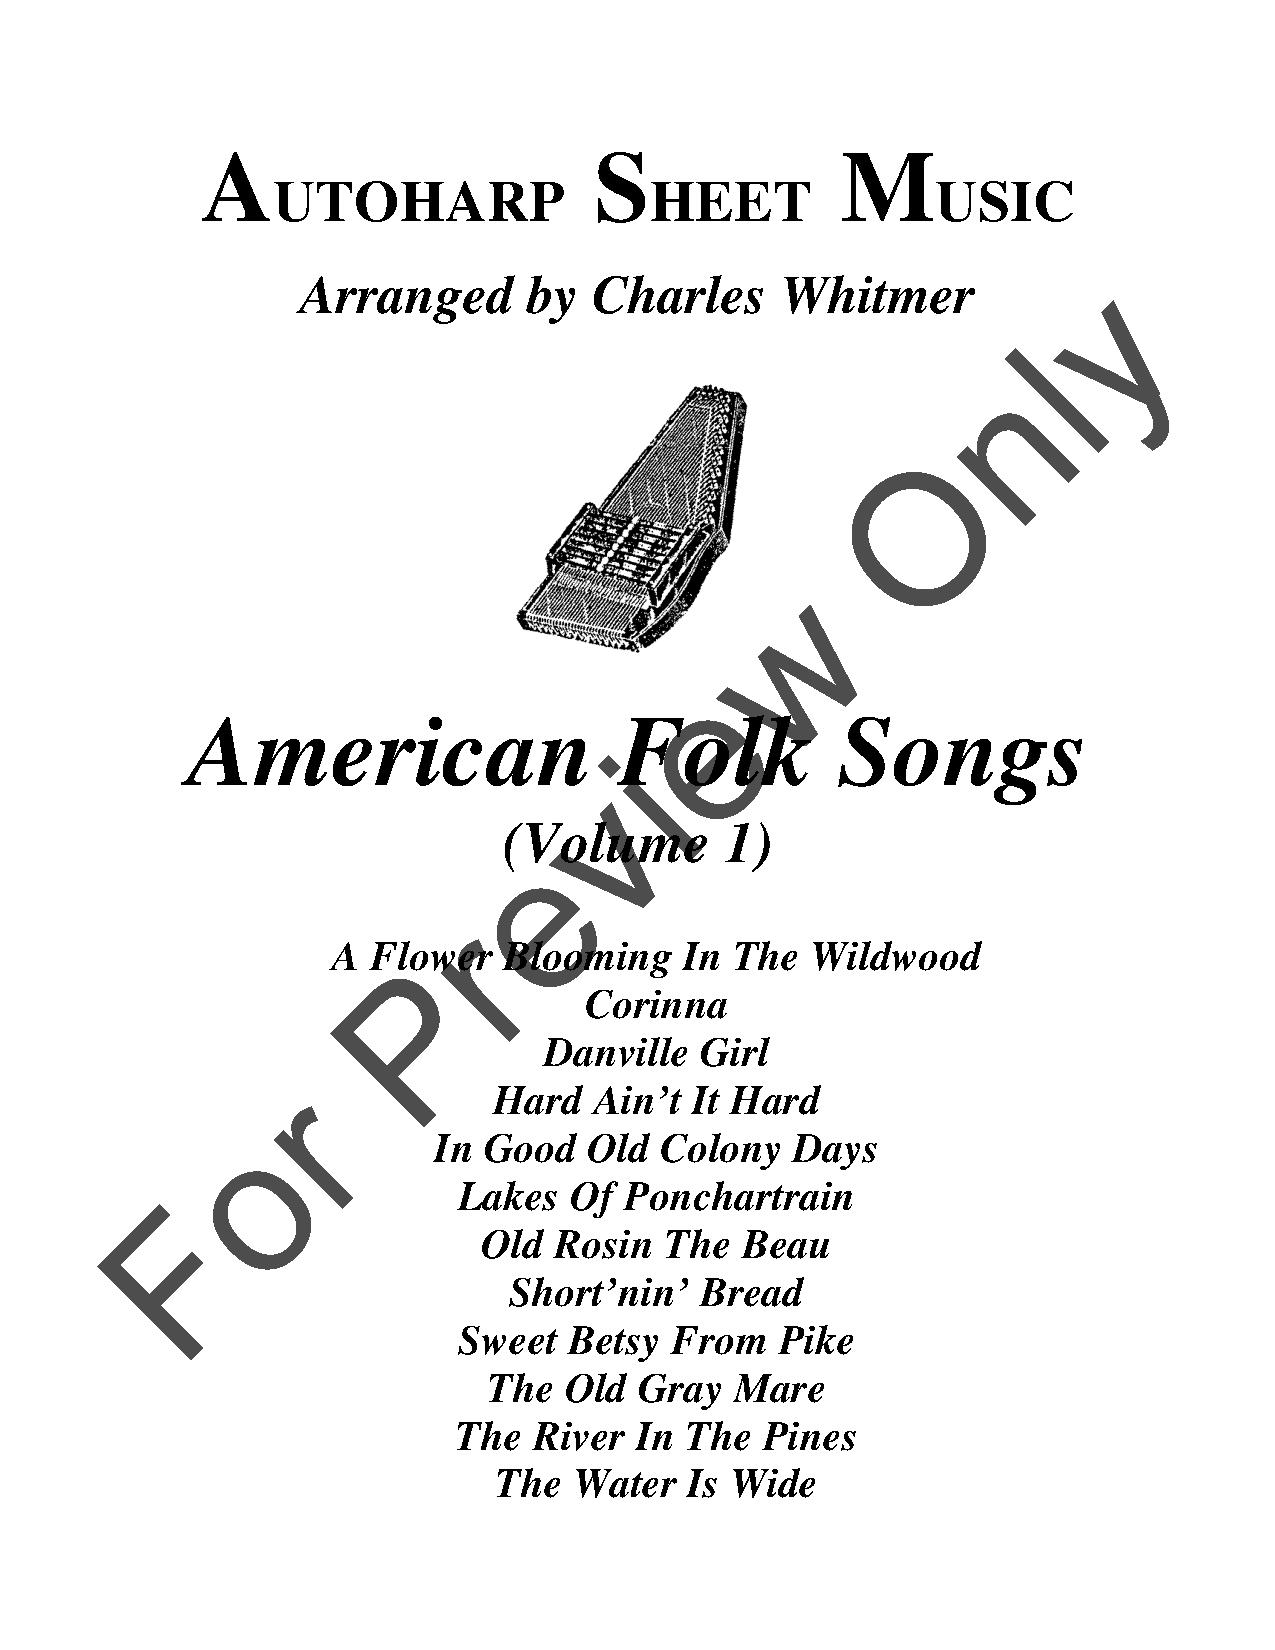 American Folk Songs, Vol. 1 Thumbnail